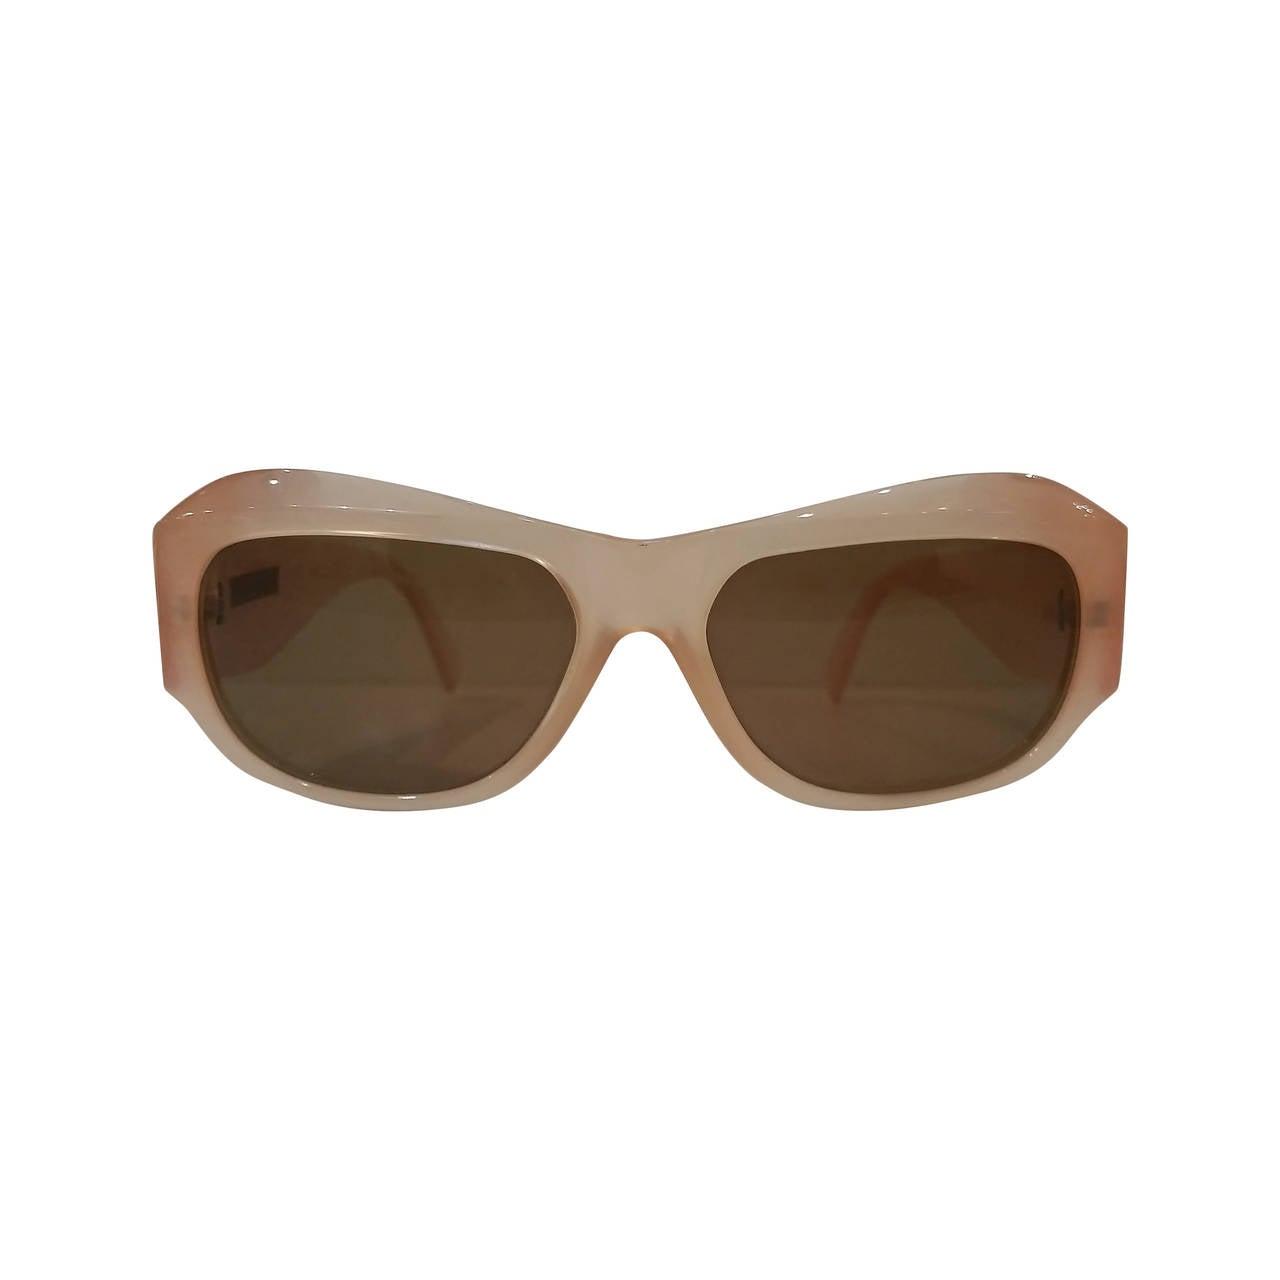 519996faae 1980s Gianni Versace peach sunglasses For Sale. 1980s Gianni Versace peach  sunglasses never used